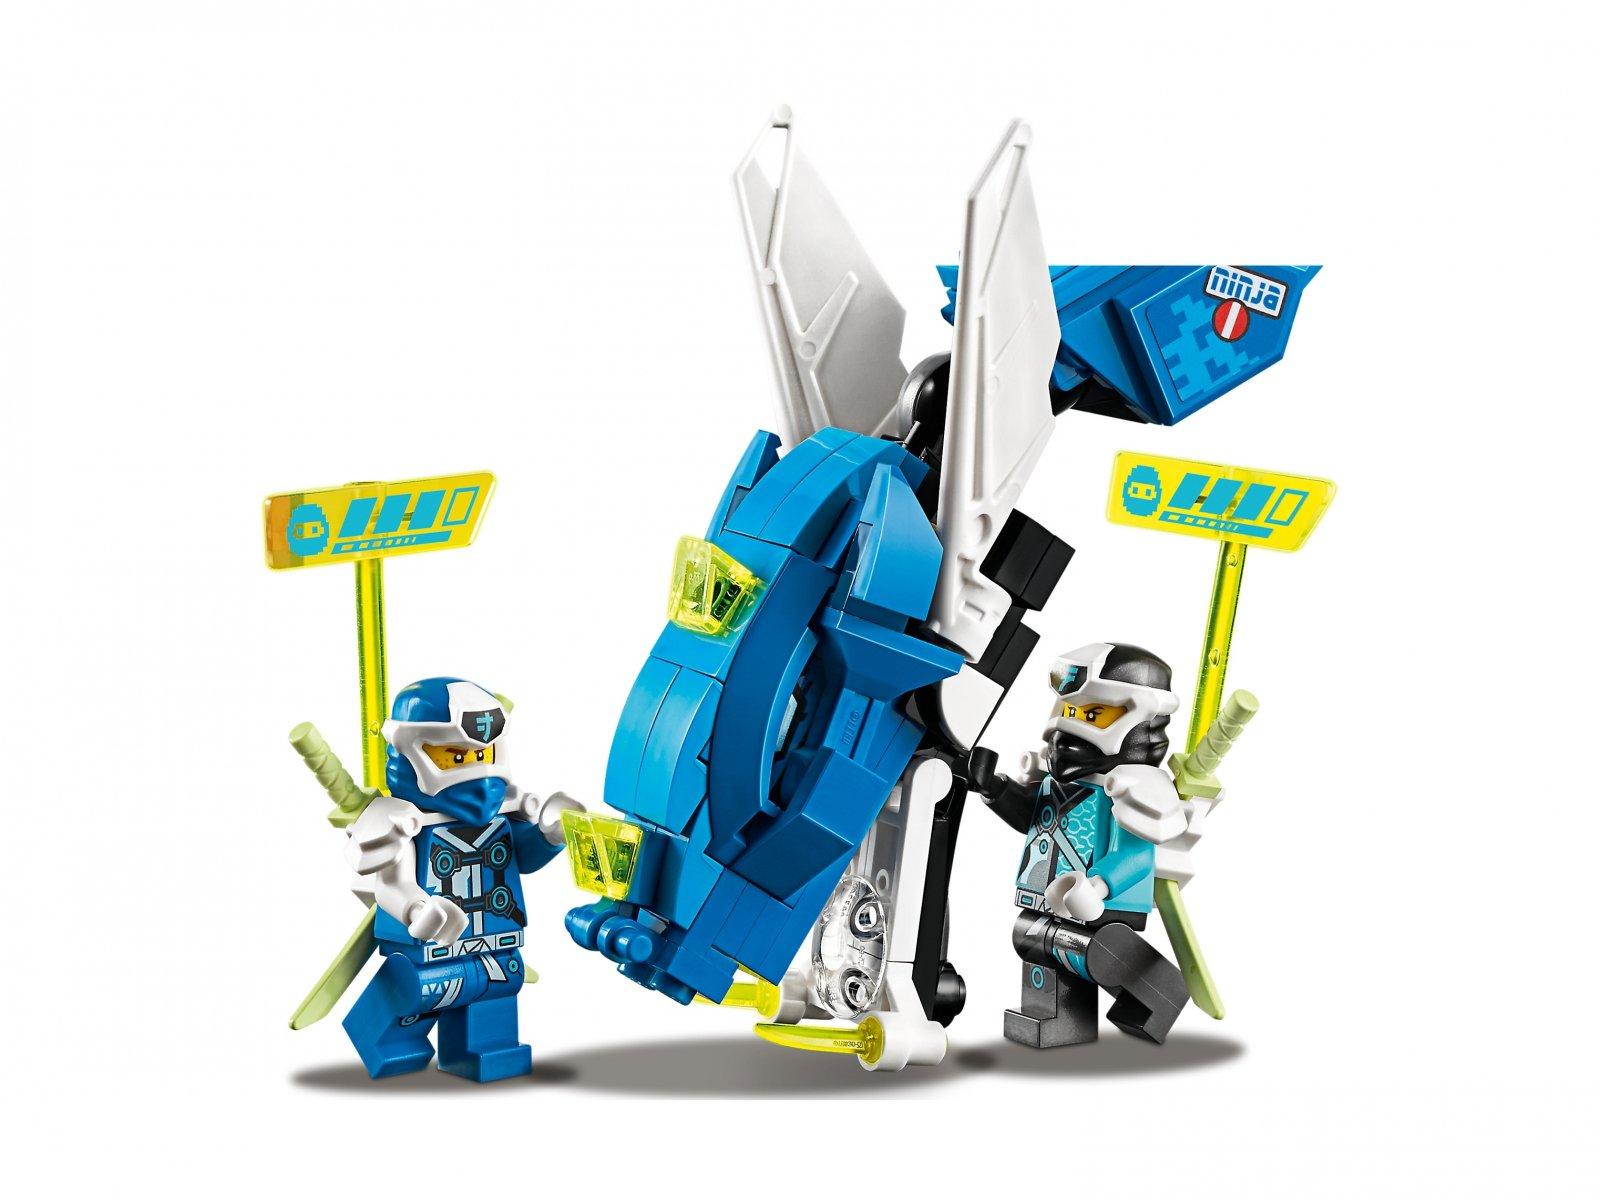 LEGO 71711 Cybersmok Jaya